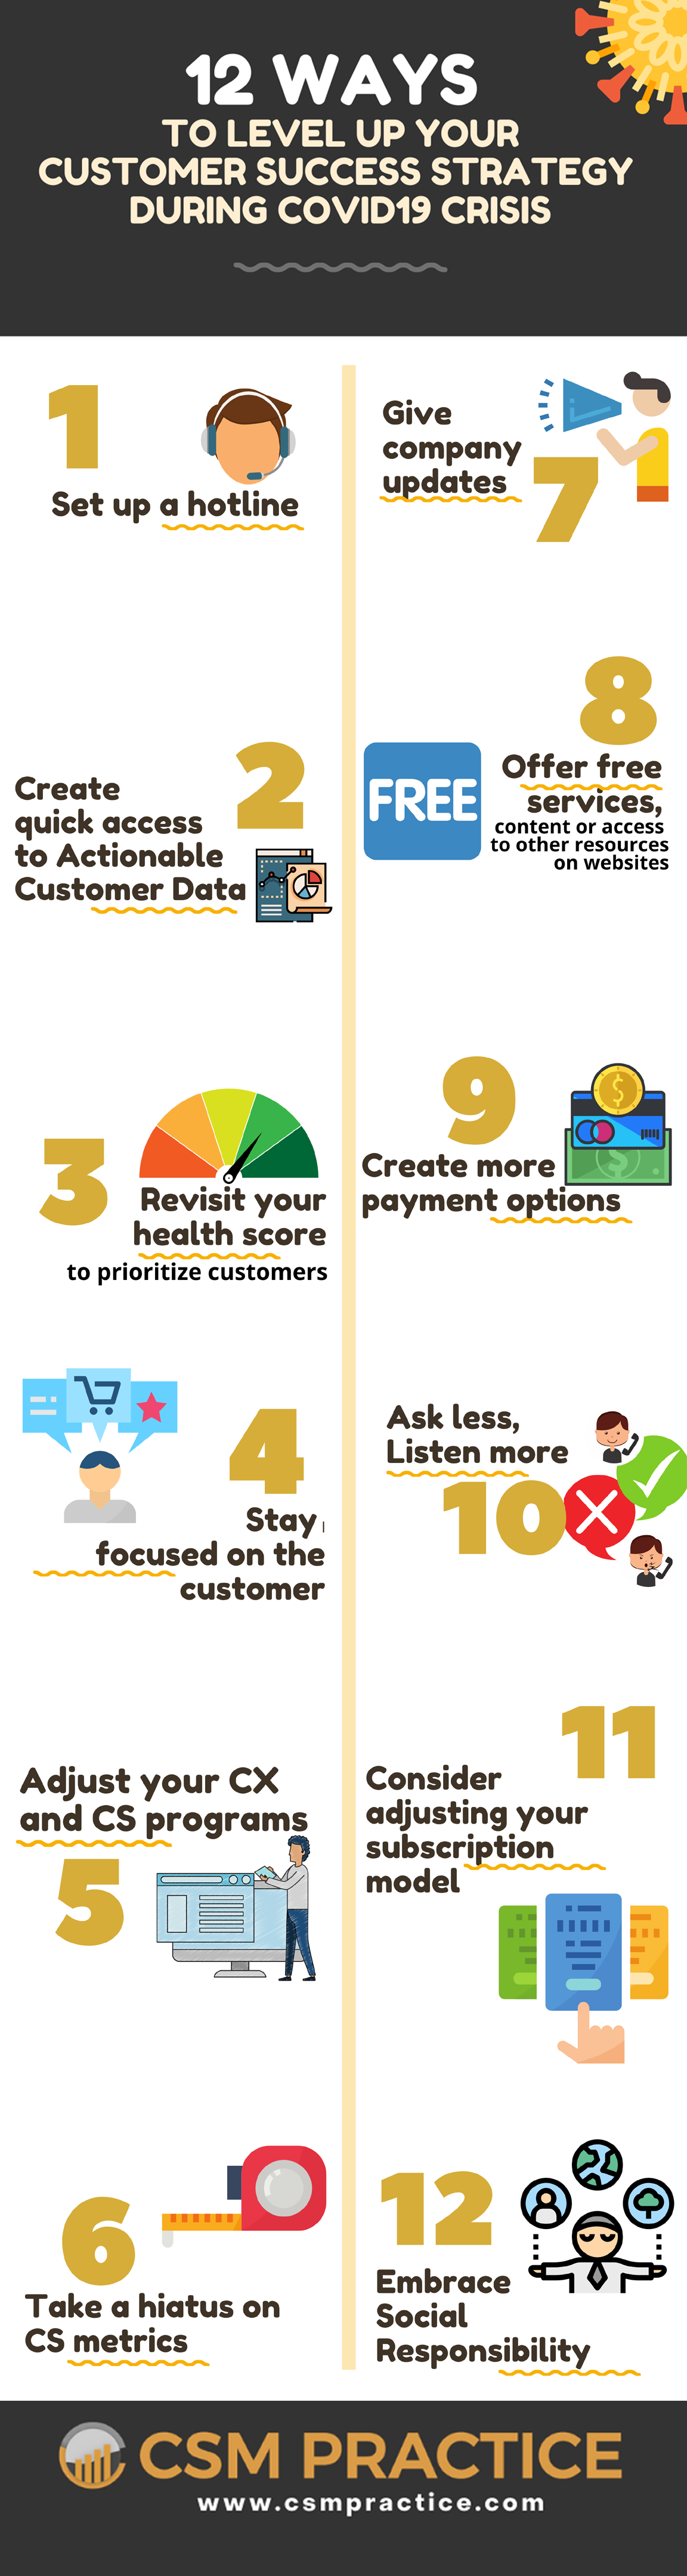 12 customer success strategy